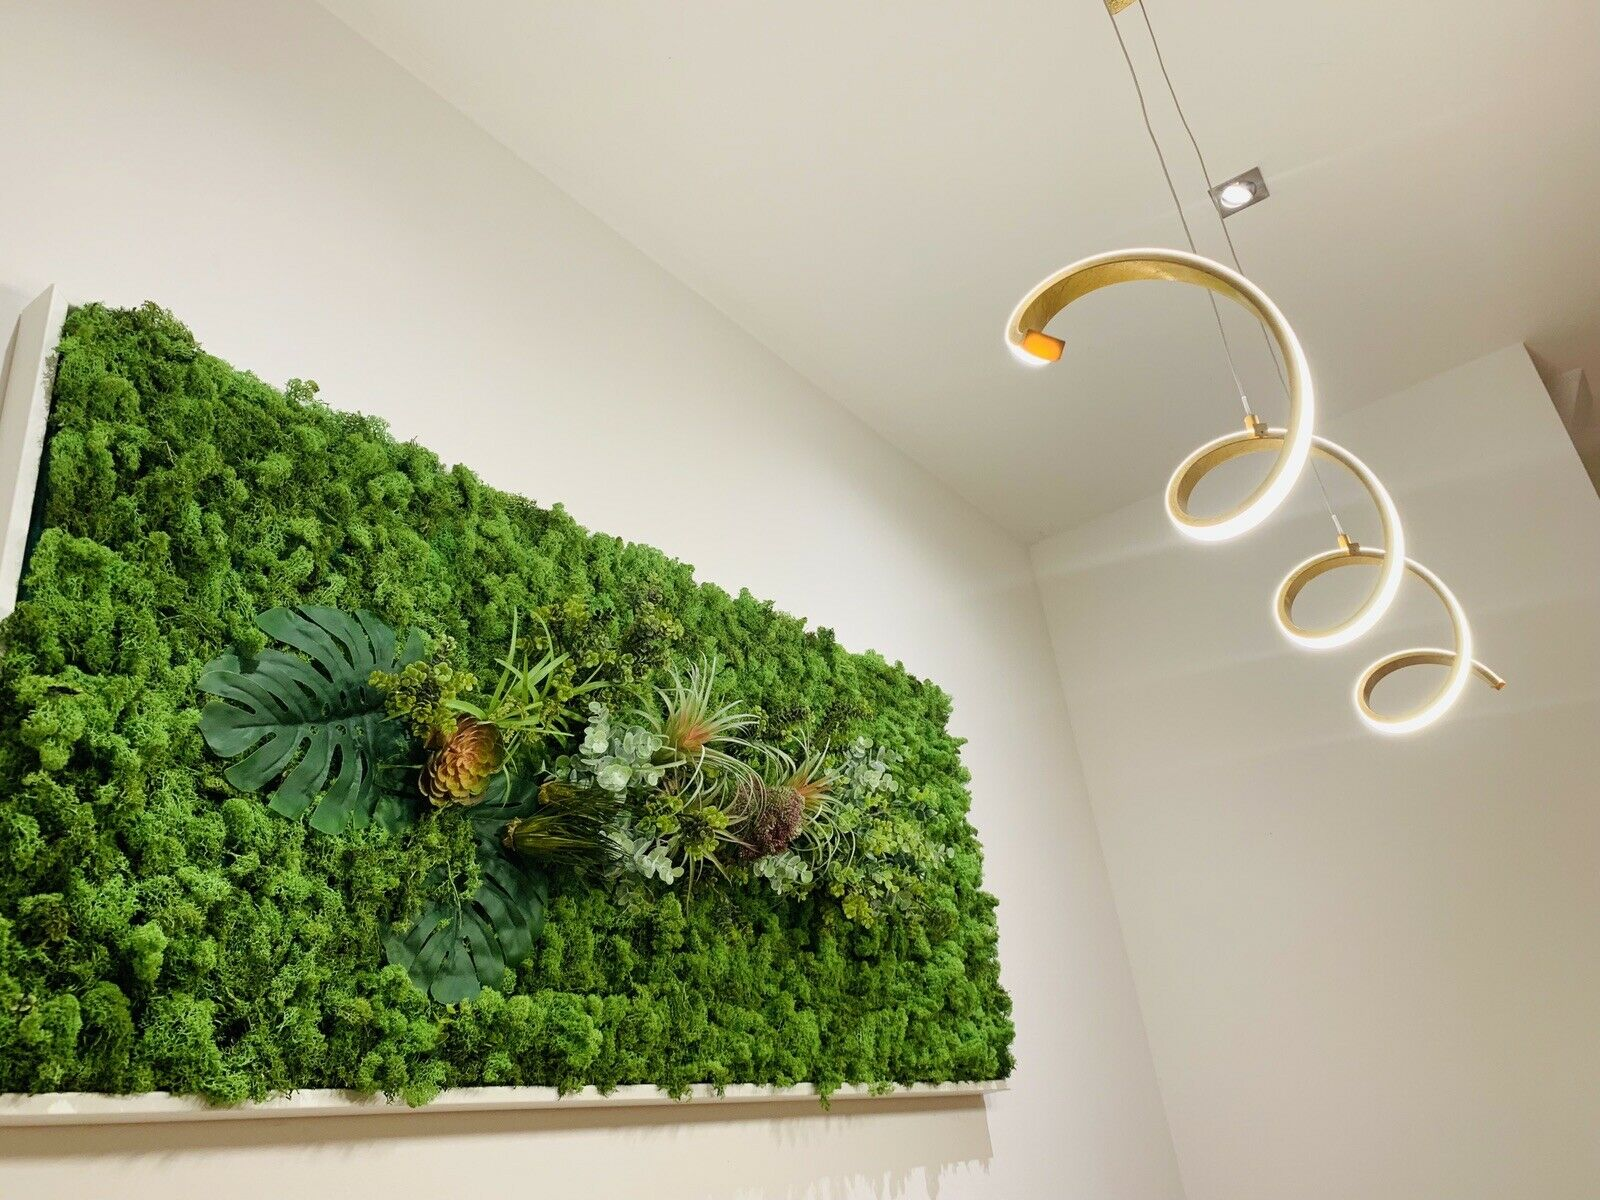 Mooswand Moosbild Moos Bild Wandbild Pflanzenbild Moosdeko 150 x 65 cm